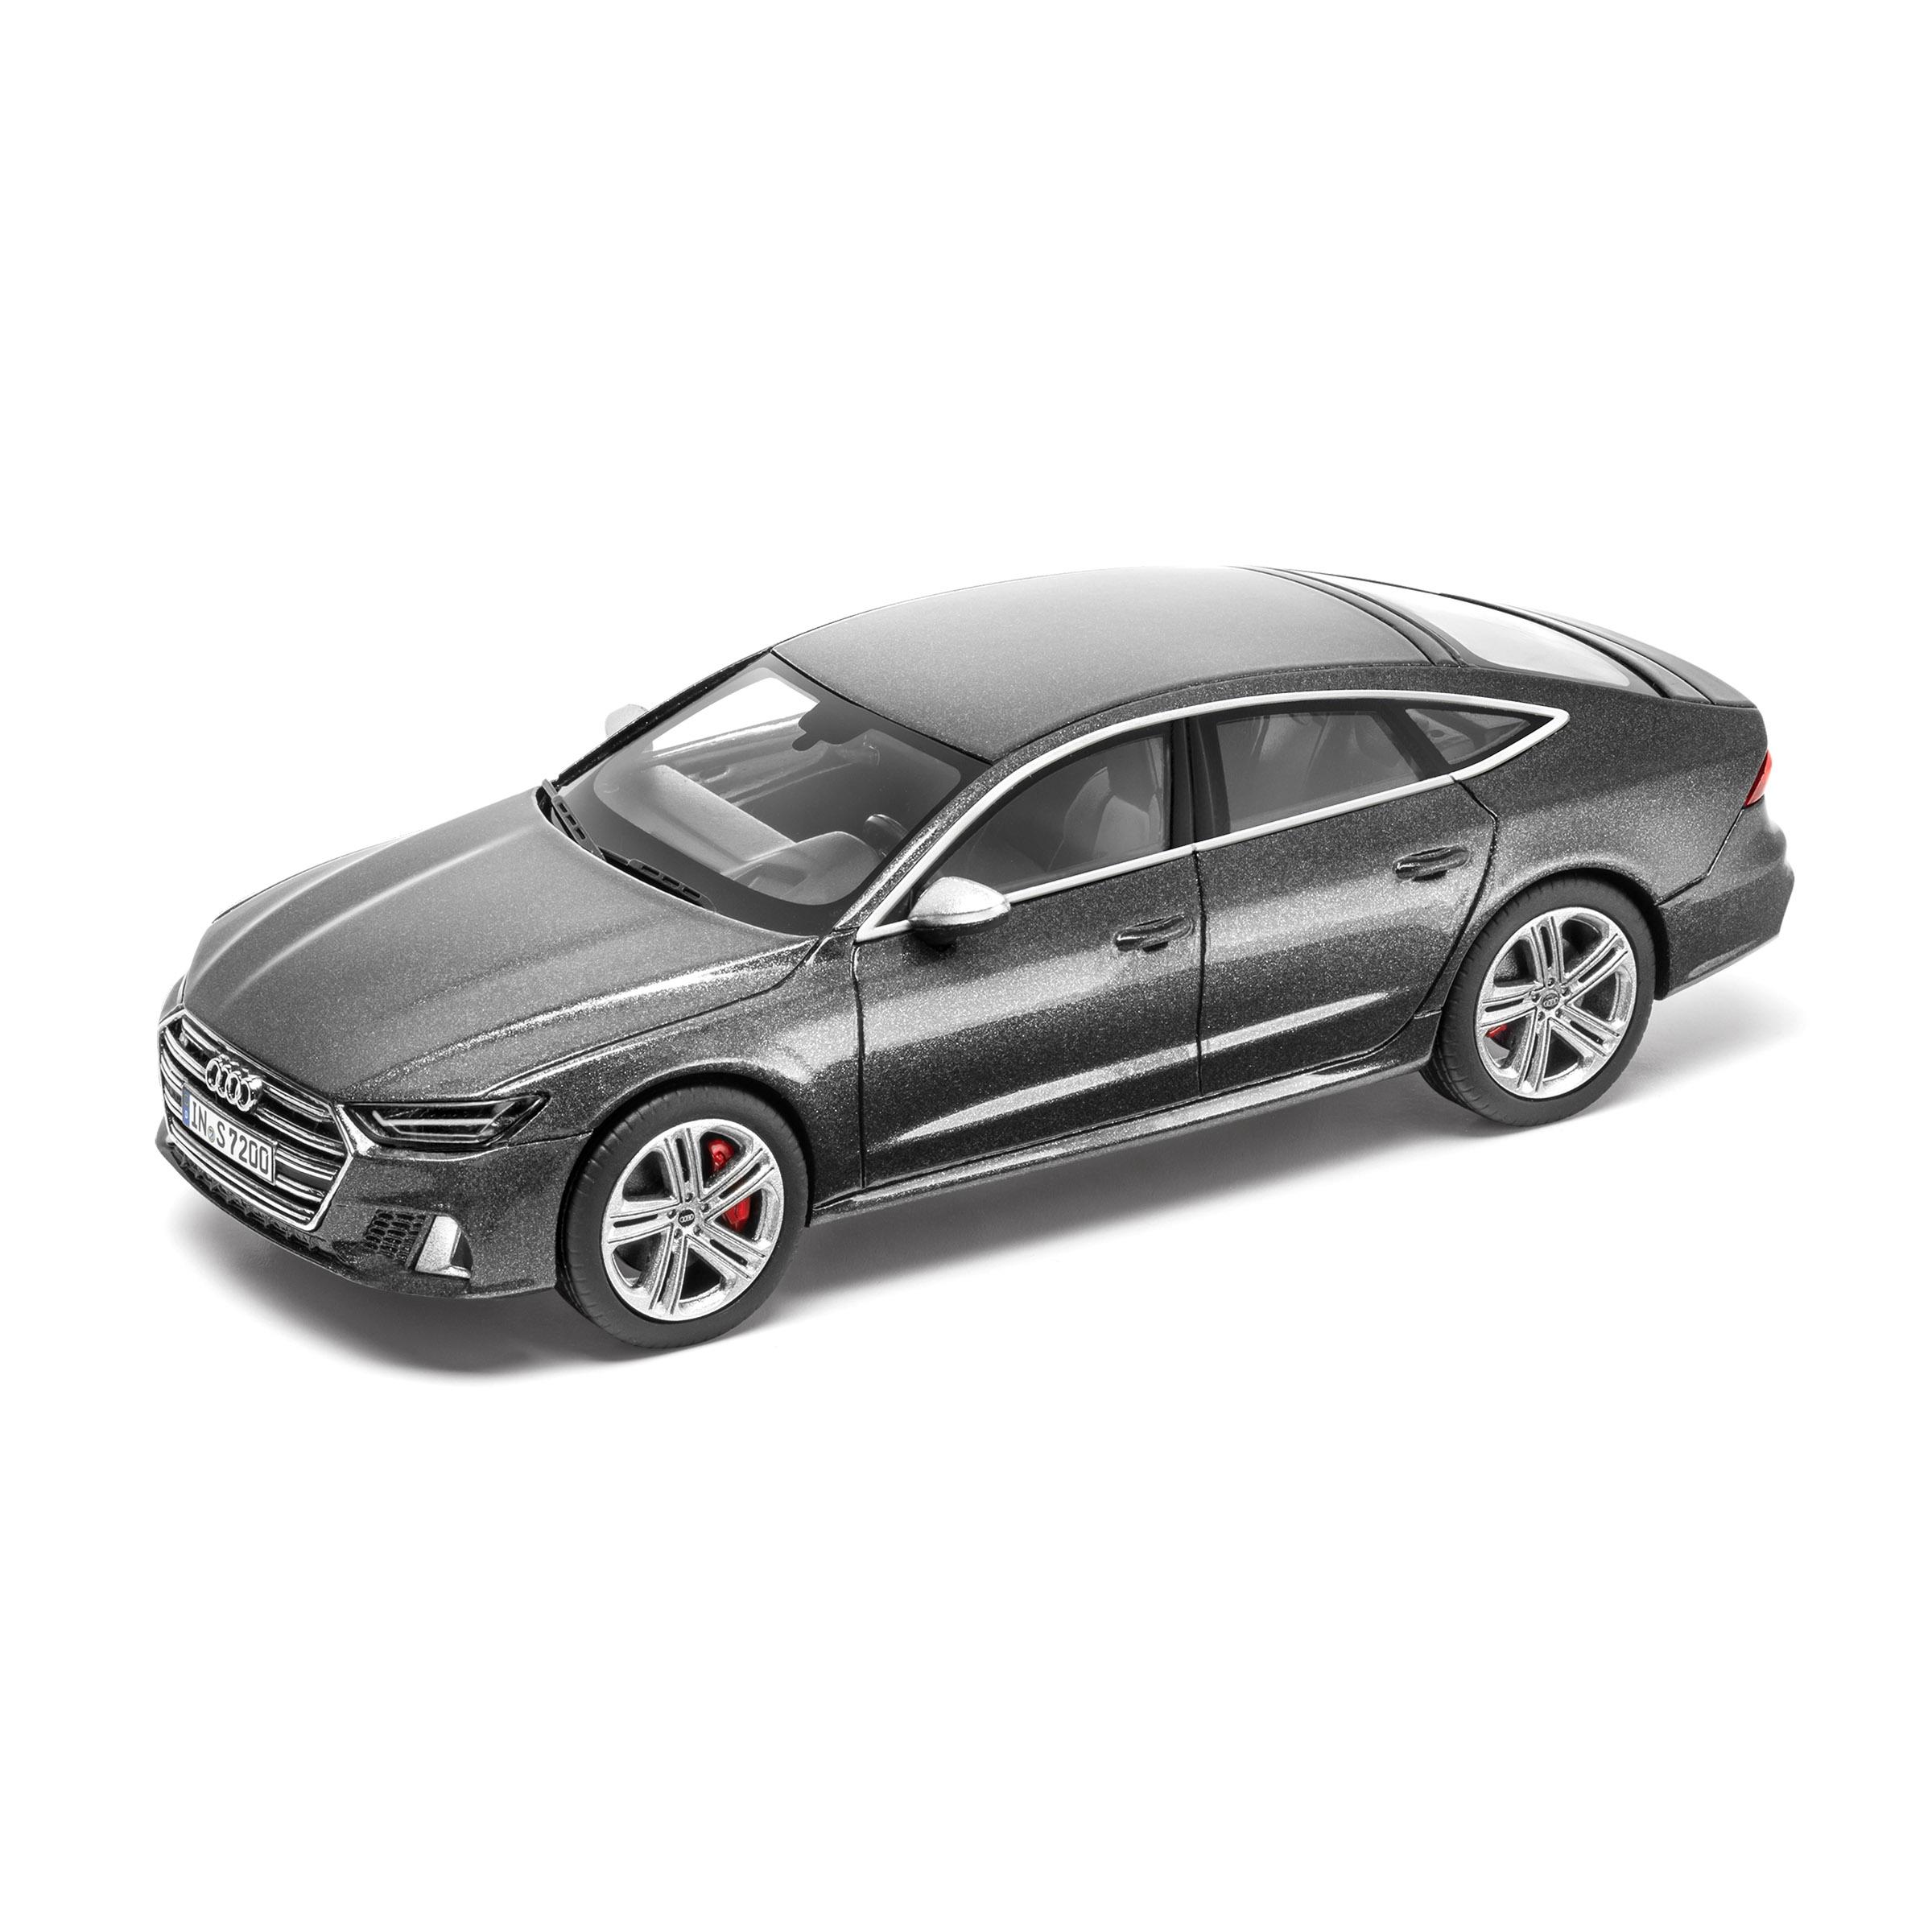 Audi S7 Sportback limitiert Daytonagrau 1:43